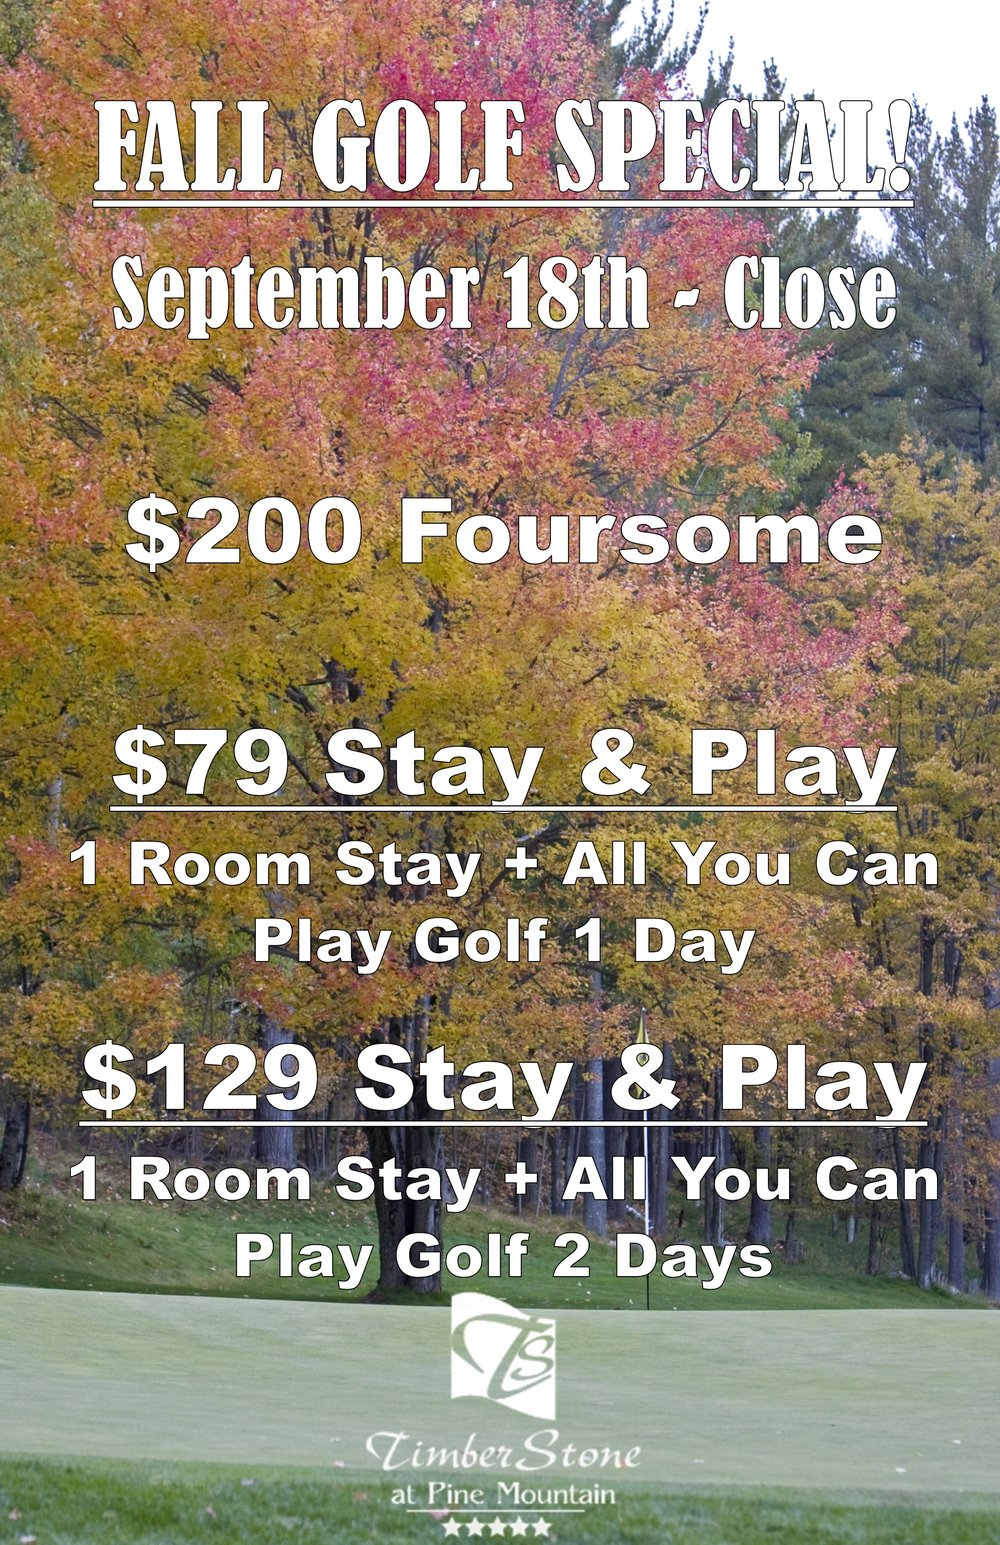 Fall Golf Special Poster.jpg